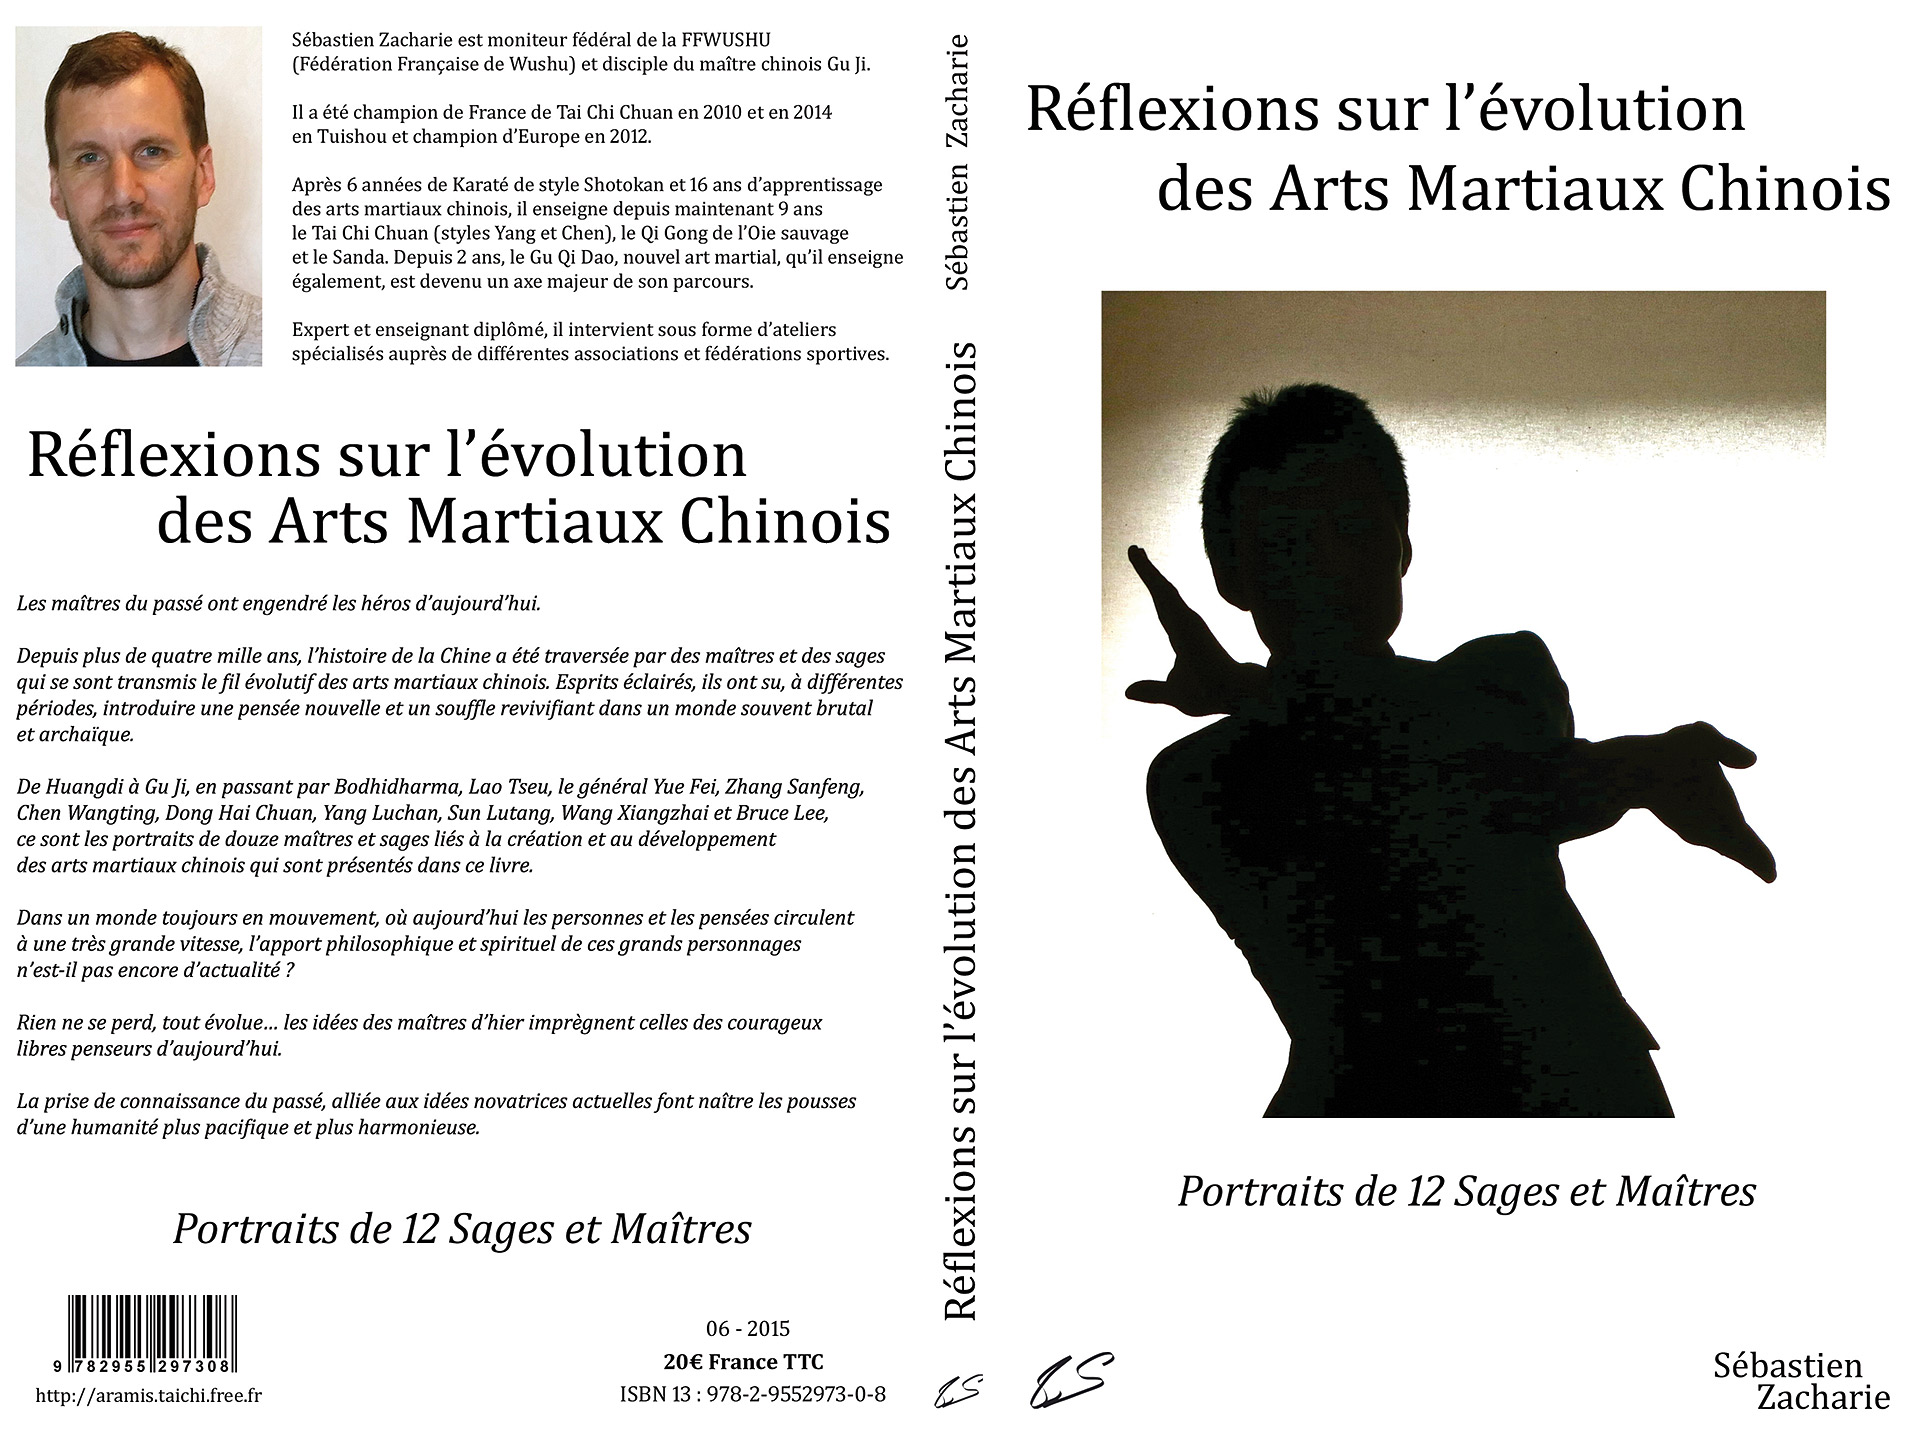 Sébastien Zacharie - Reflexions sur l'évolution des arts martiaux chinois - Tai chi chuan - Tai-chi-chuan - Martial - Tai-chi-chuan Martial - Tai-chi-chuan Santé - Qi Gong - Sanda - Gu Qi Dao - Aramis - Houilles